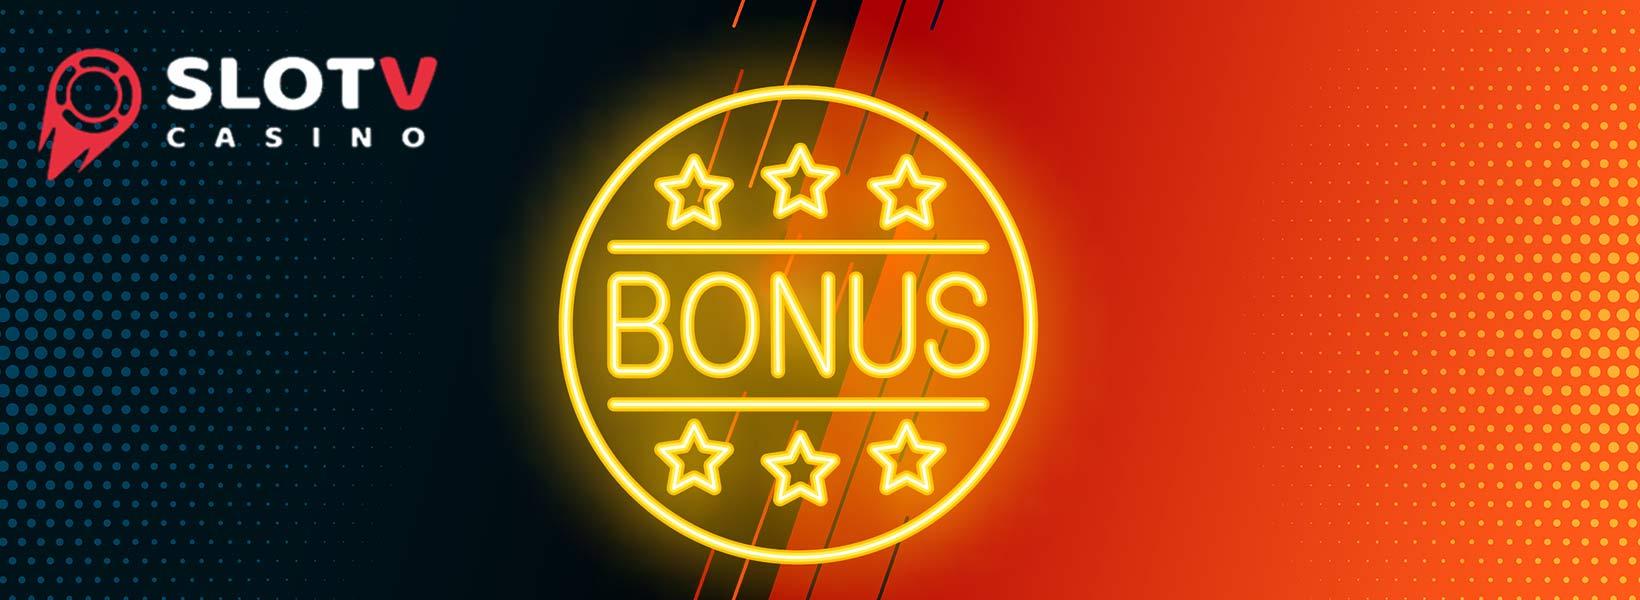 bonus slotv